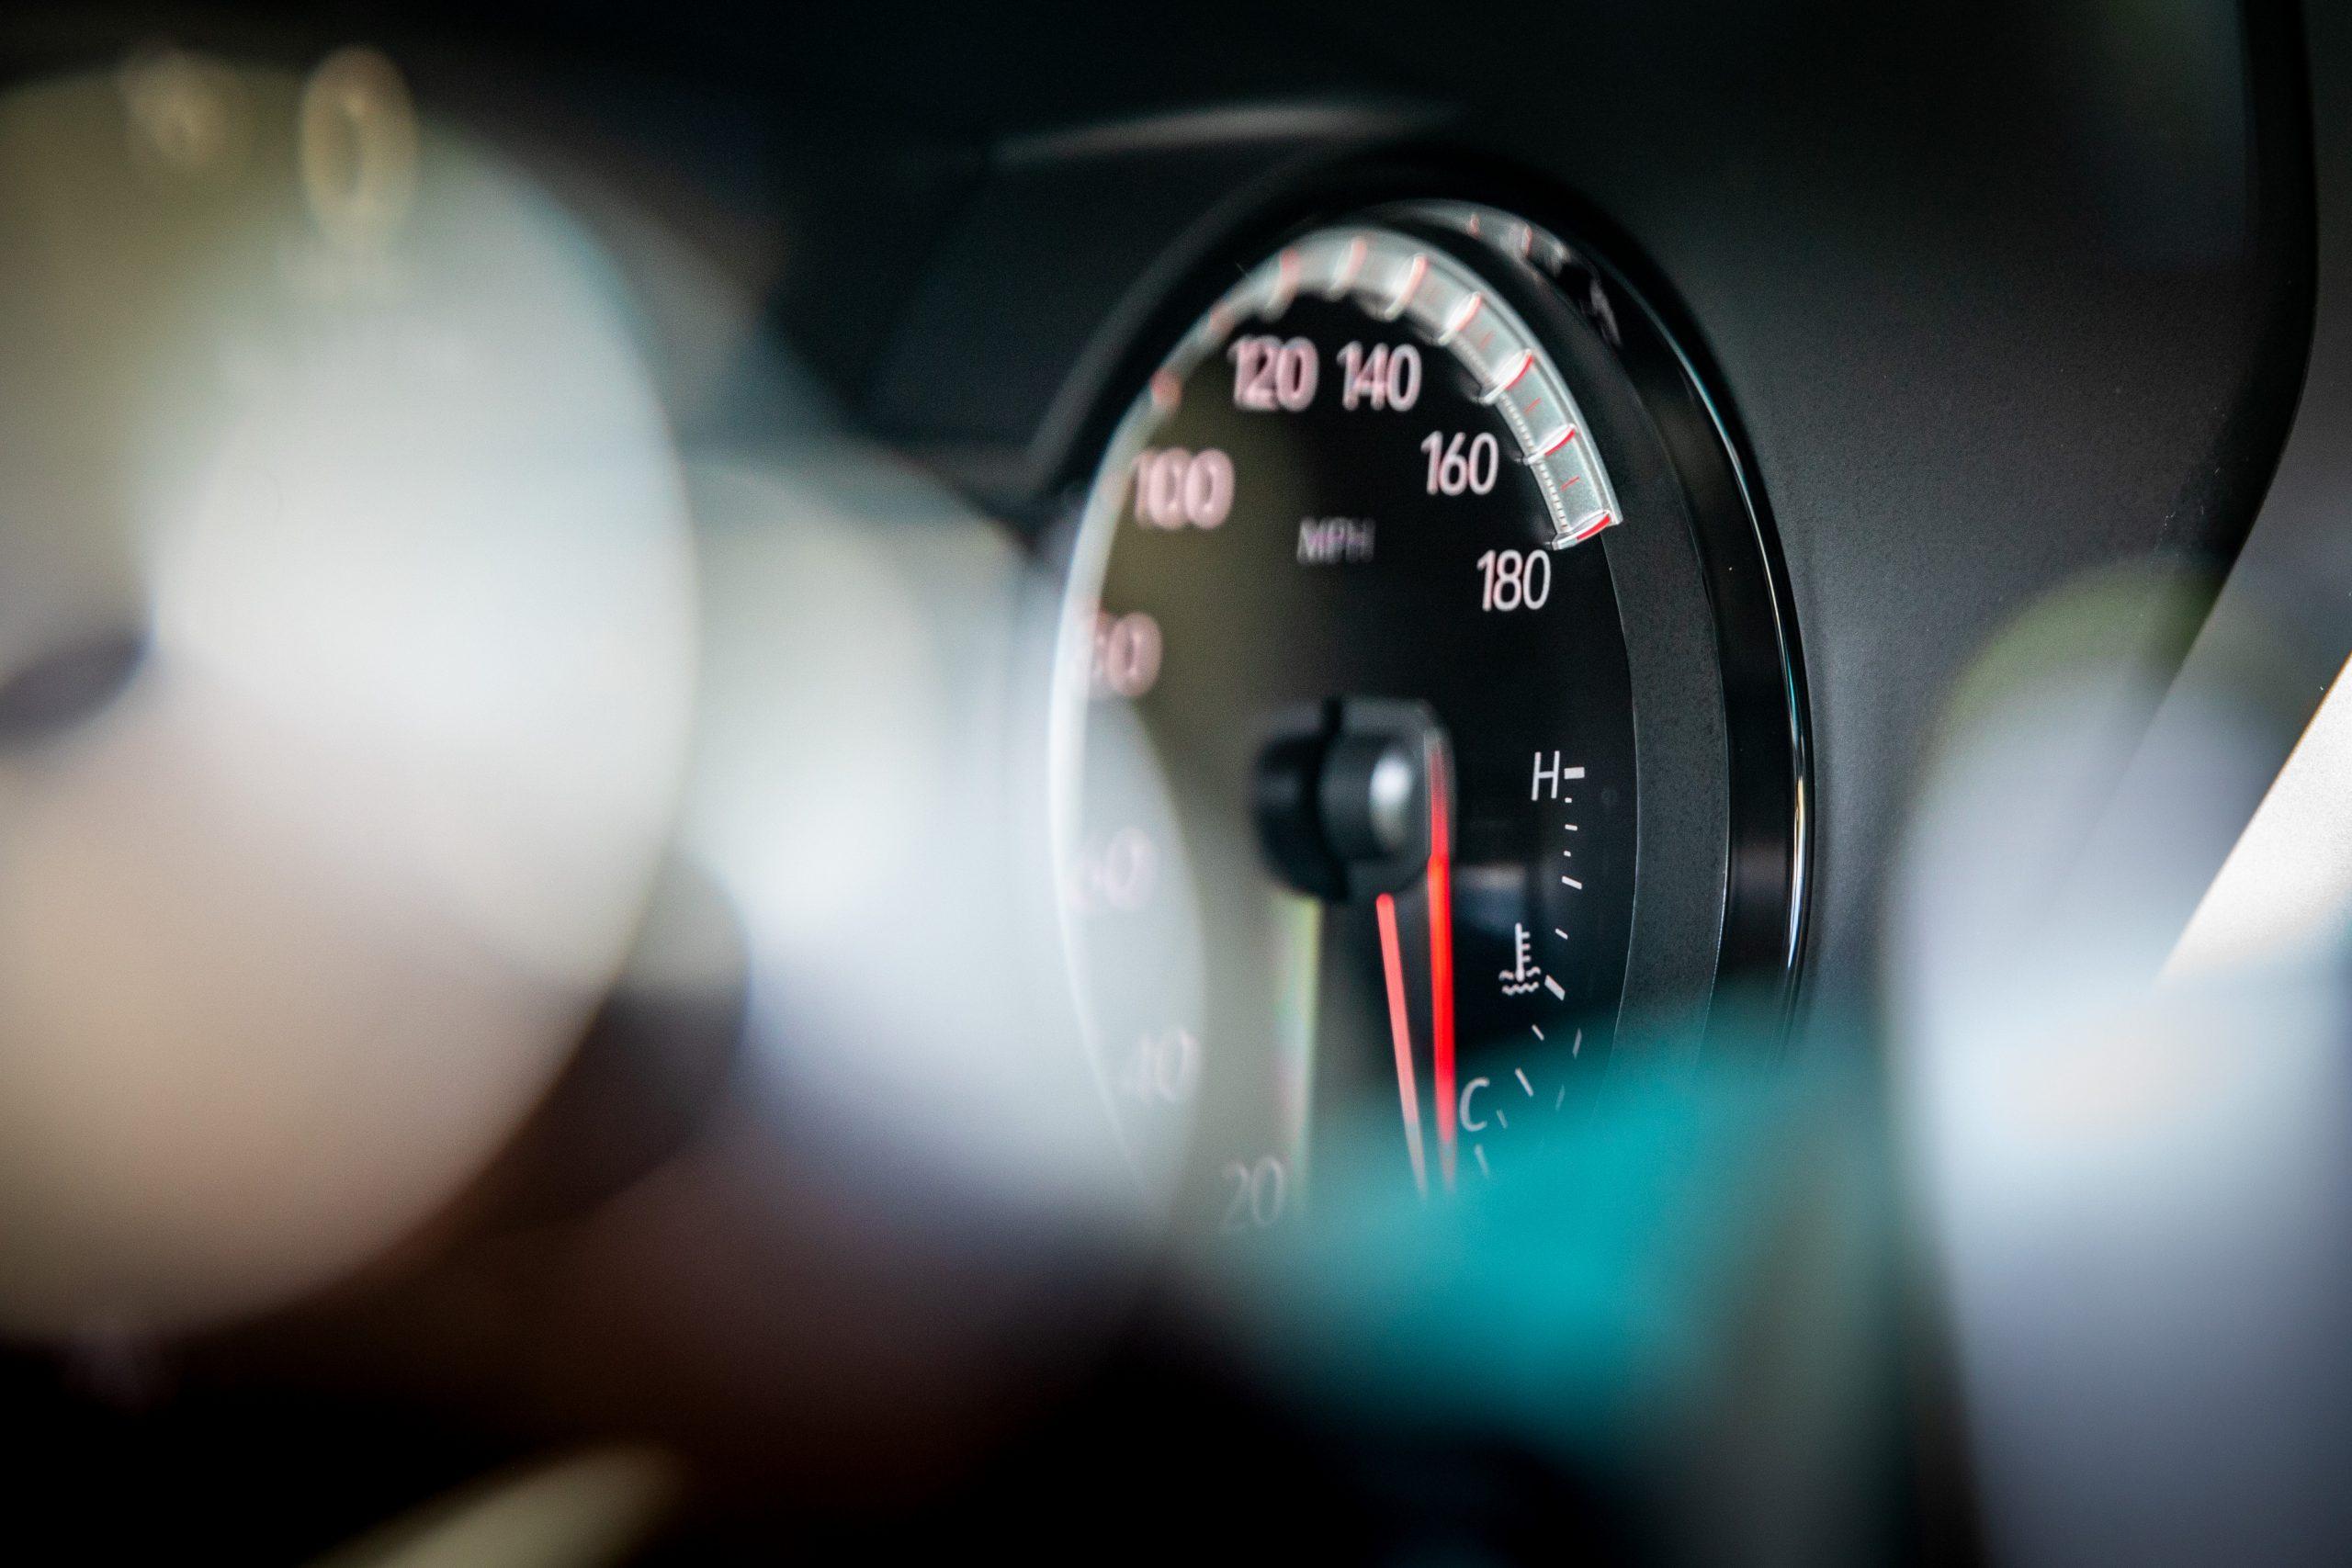 2020 Cadillac CT4-V 24 speedometer